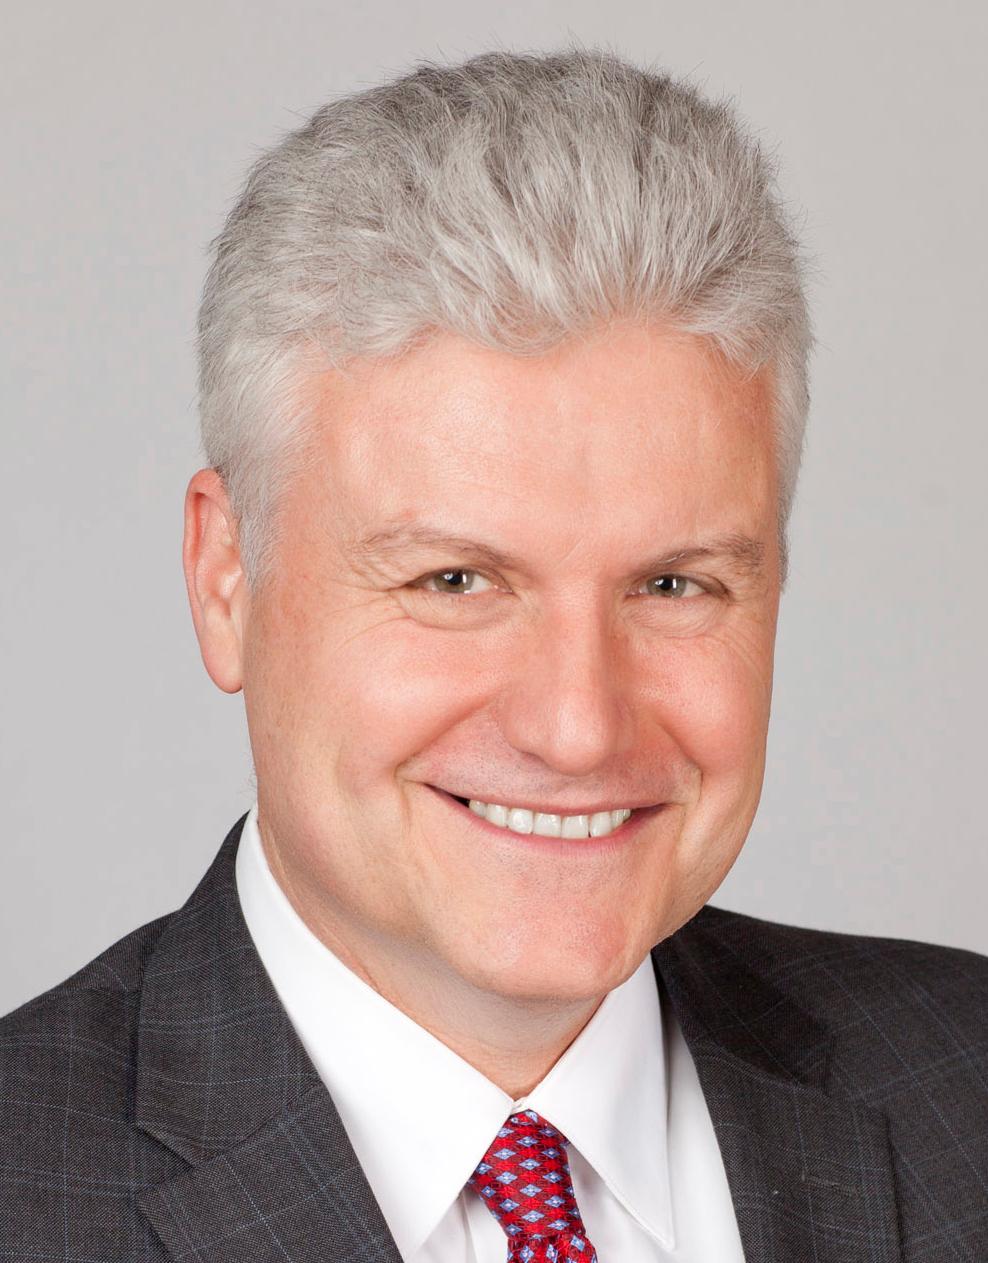 Johannes Vieweg